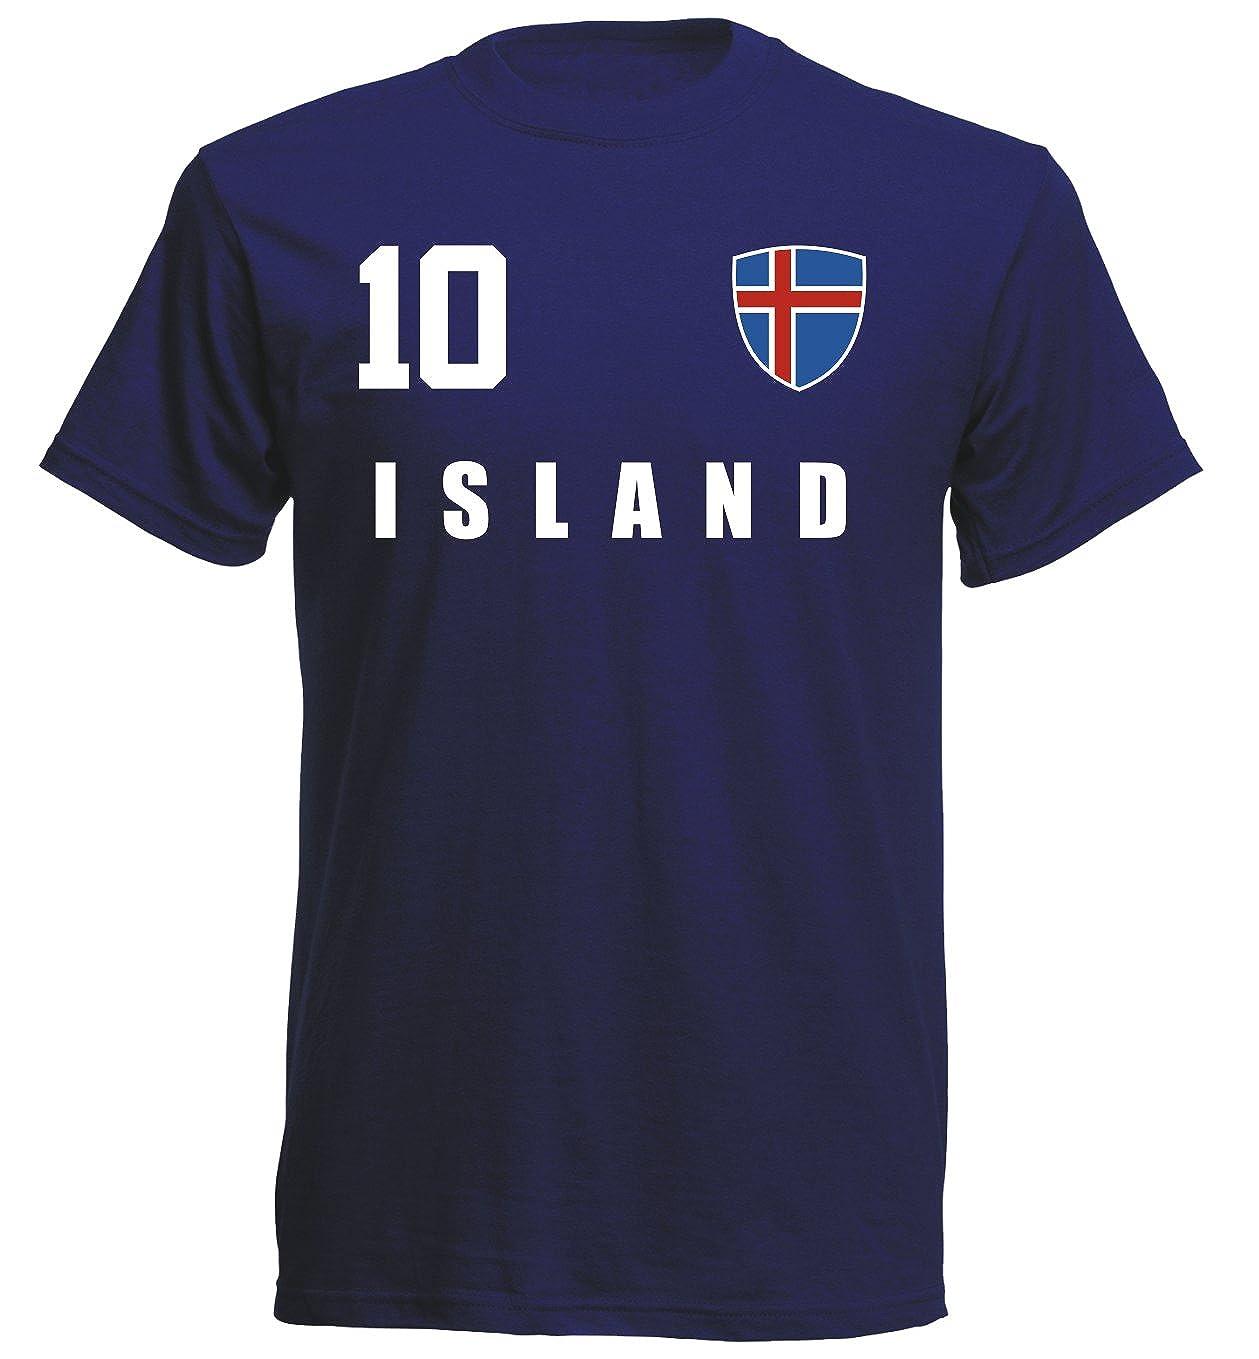 Island WM 2018 T-Shirt Navy Trikot Fußball Nr ALL 10 Sport